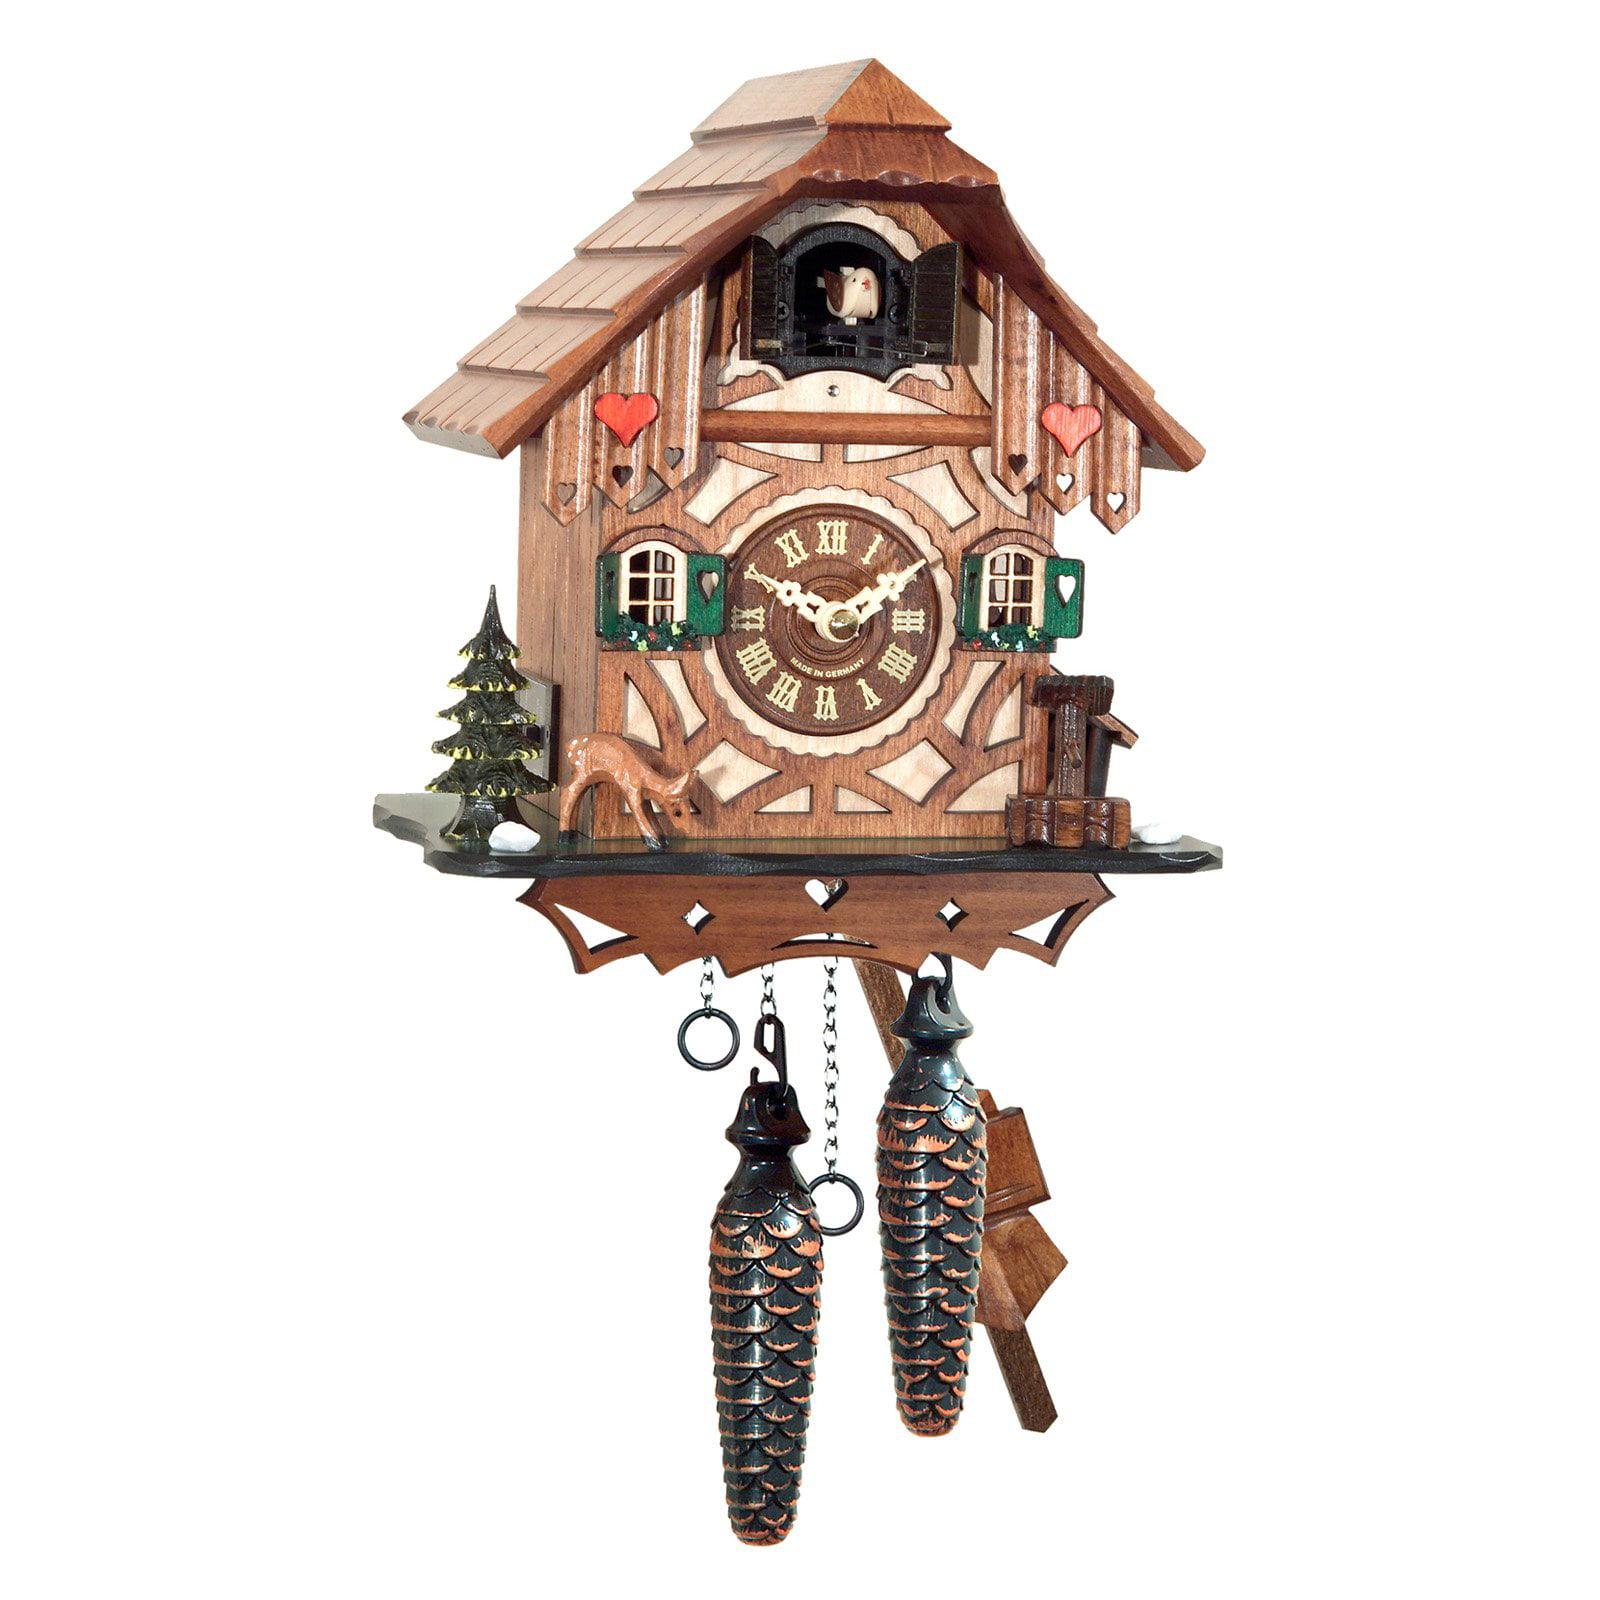 Black Forest Chalet with Deer Cuckoo Clock by Alexander Taron